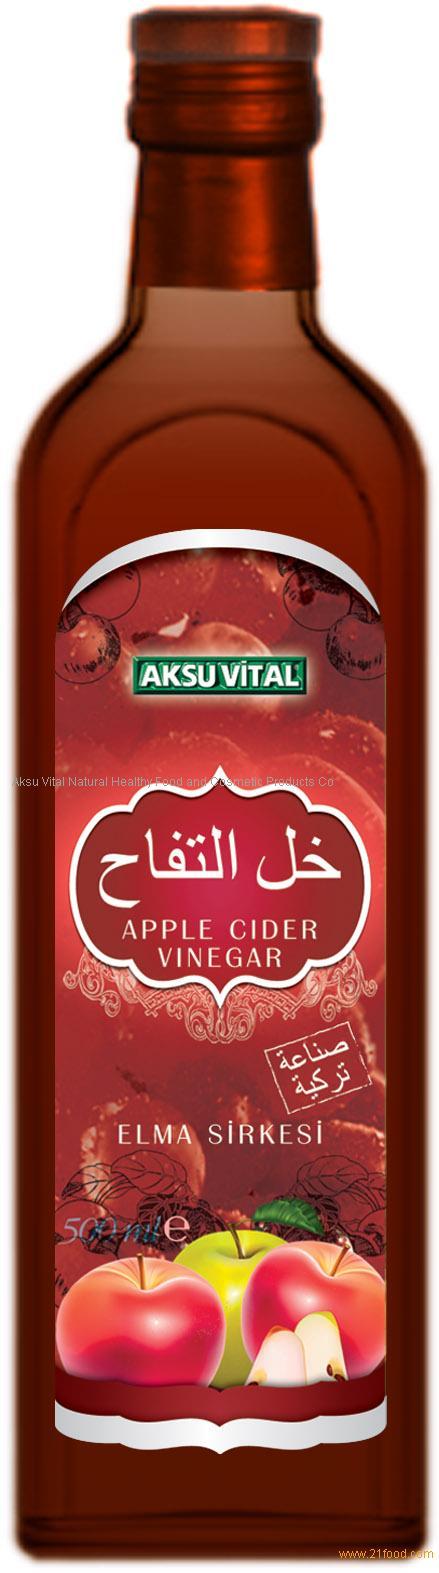 Natural Apple Cider Vinegar in Glass Bottle 500 ml